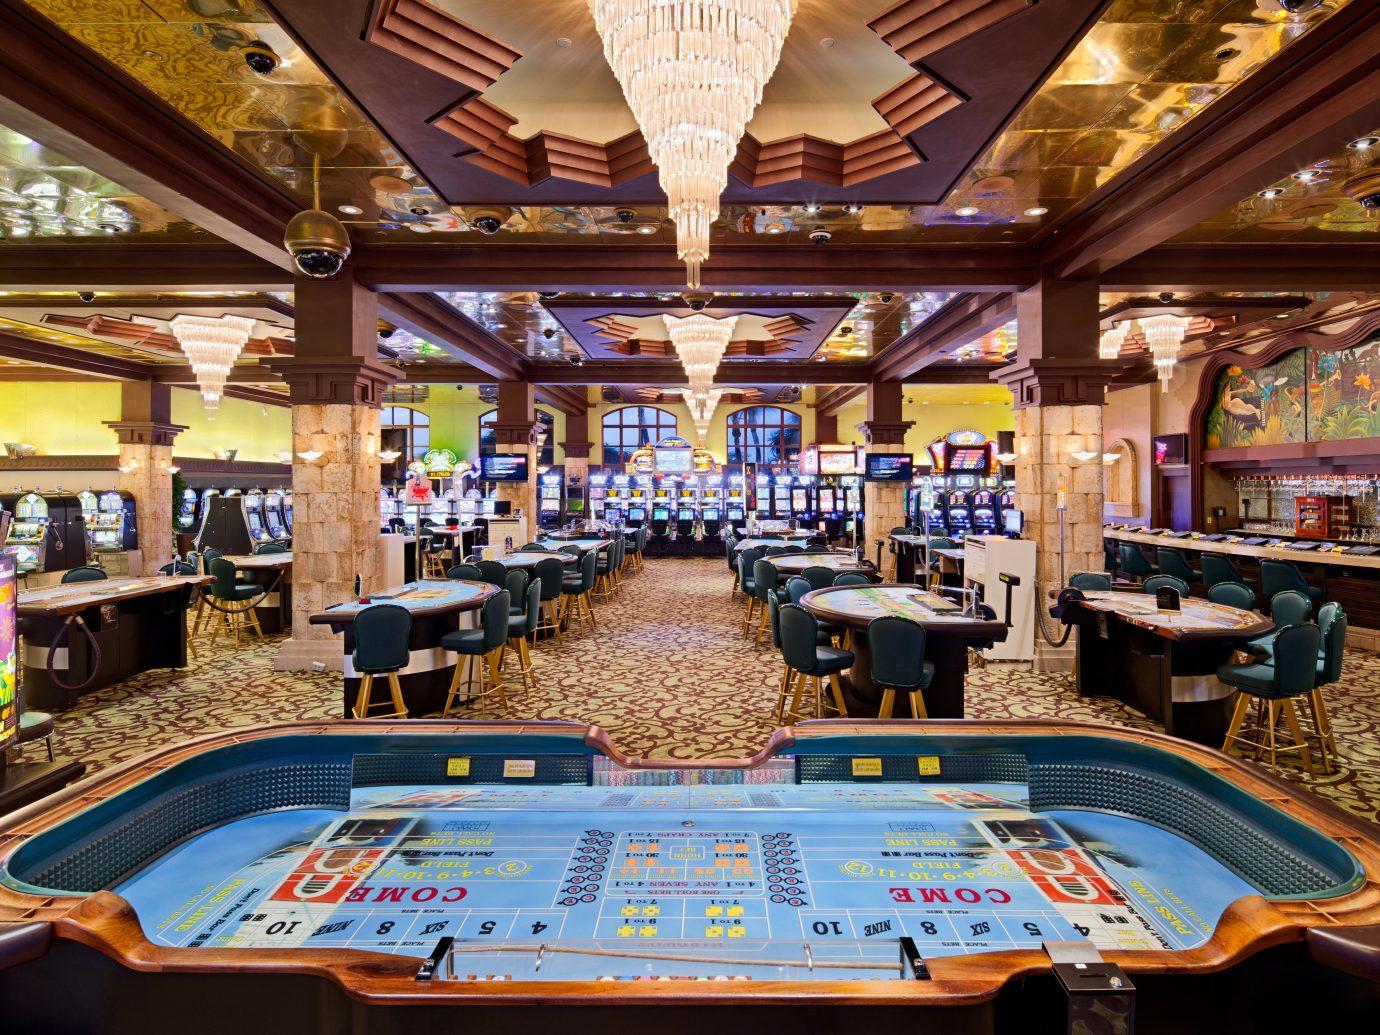 Aruba Beachfront caribbean Casino Classic Hotels Play Resort Tropical indoor ceiling recreation room building billiard room games several